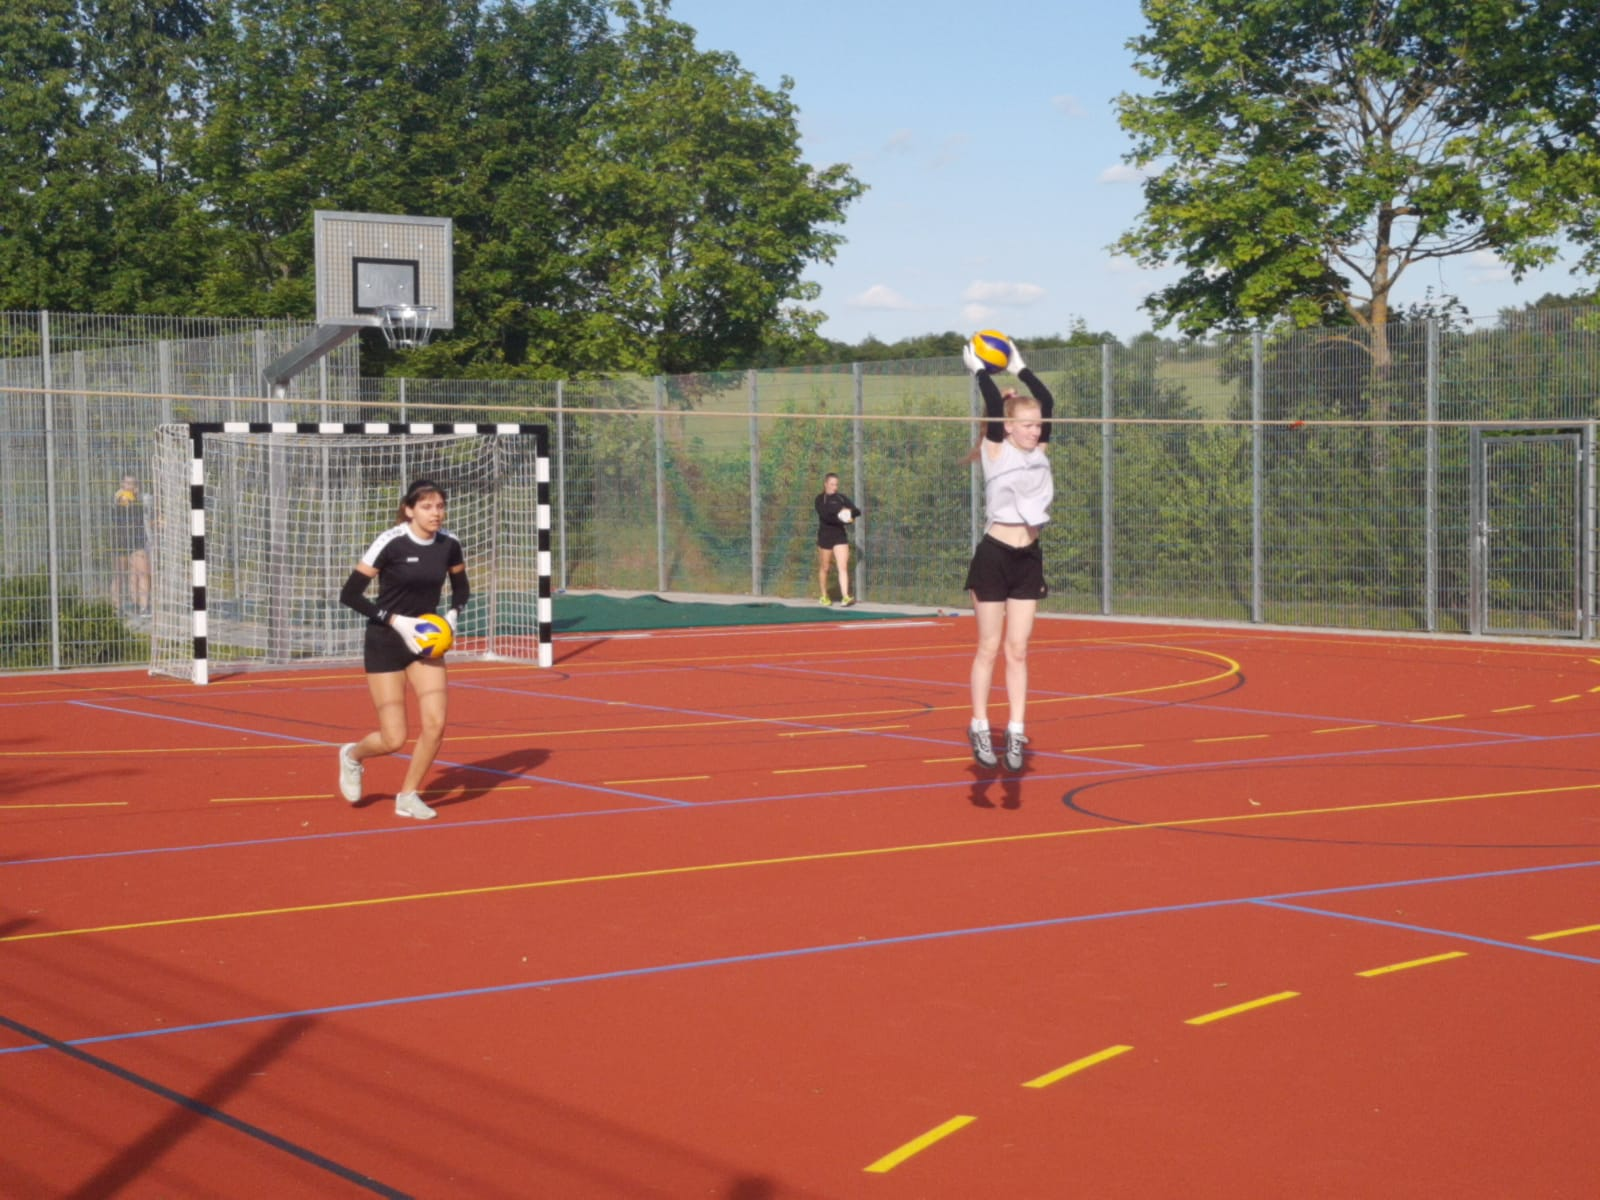 20200605_Volleyballdamen_Trainingsbeginn07